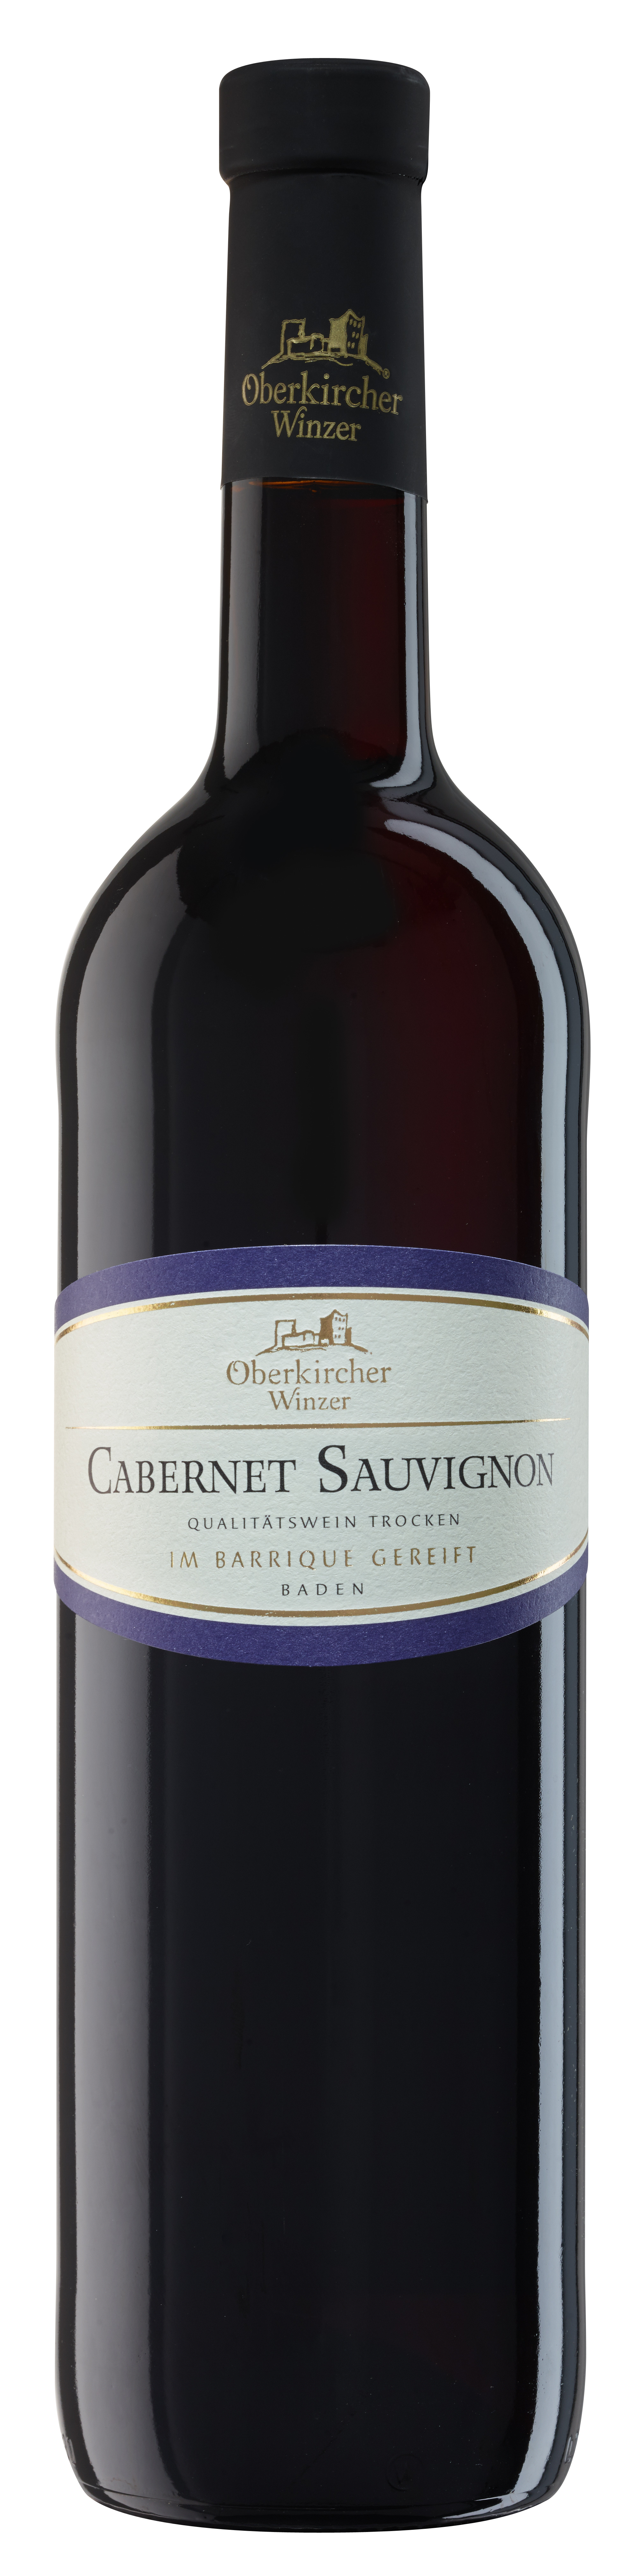 Vinum Nobile, Cabernet Sauvignon Qualitätswein trocken-Barrique-